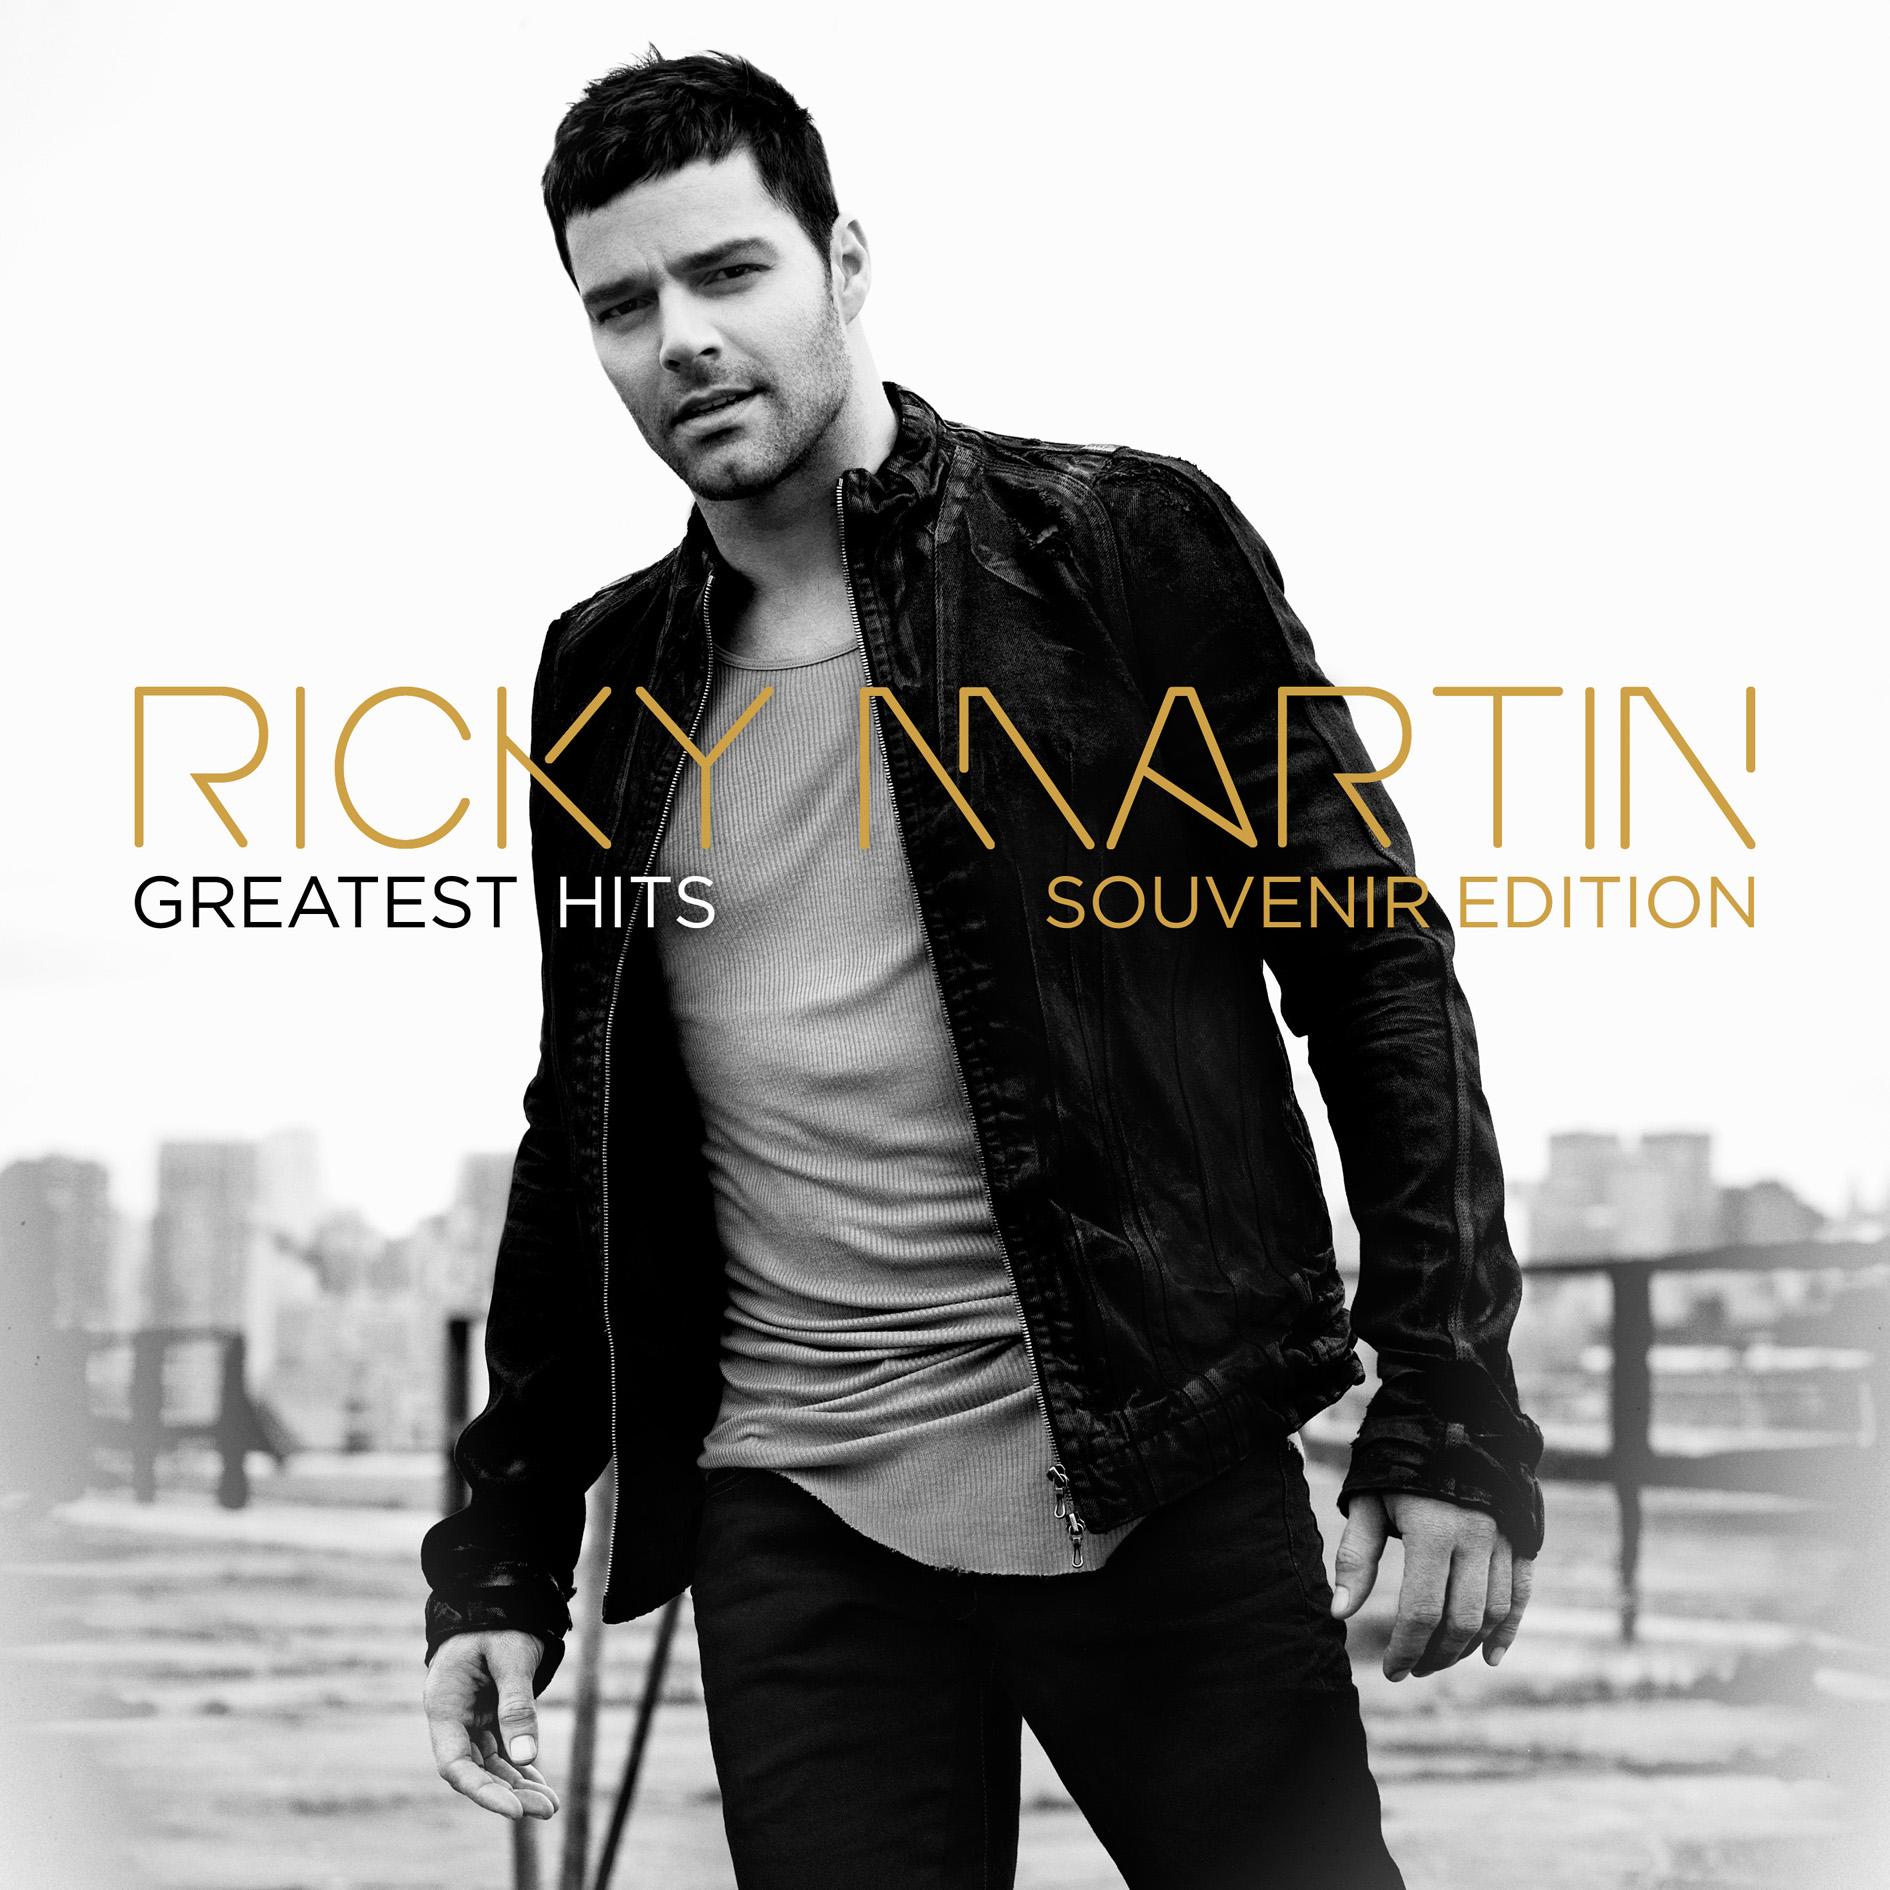 http://1.bp.blogspot.com/-ESVKmc2U0D4/UU-YEb2z20I/AAAAAAAAsgw/1JFknZlNsBI/s2000/Ricky+Martin+Greatest+Hits+Souvenir+Edition.jpg